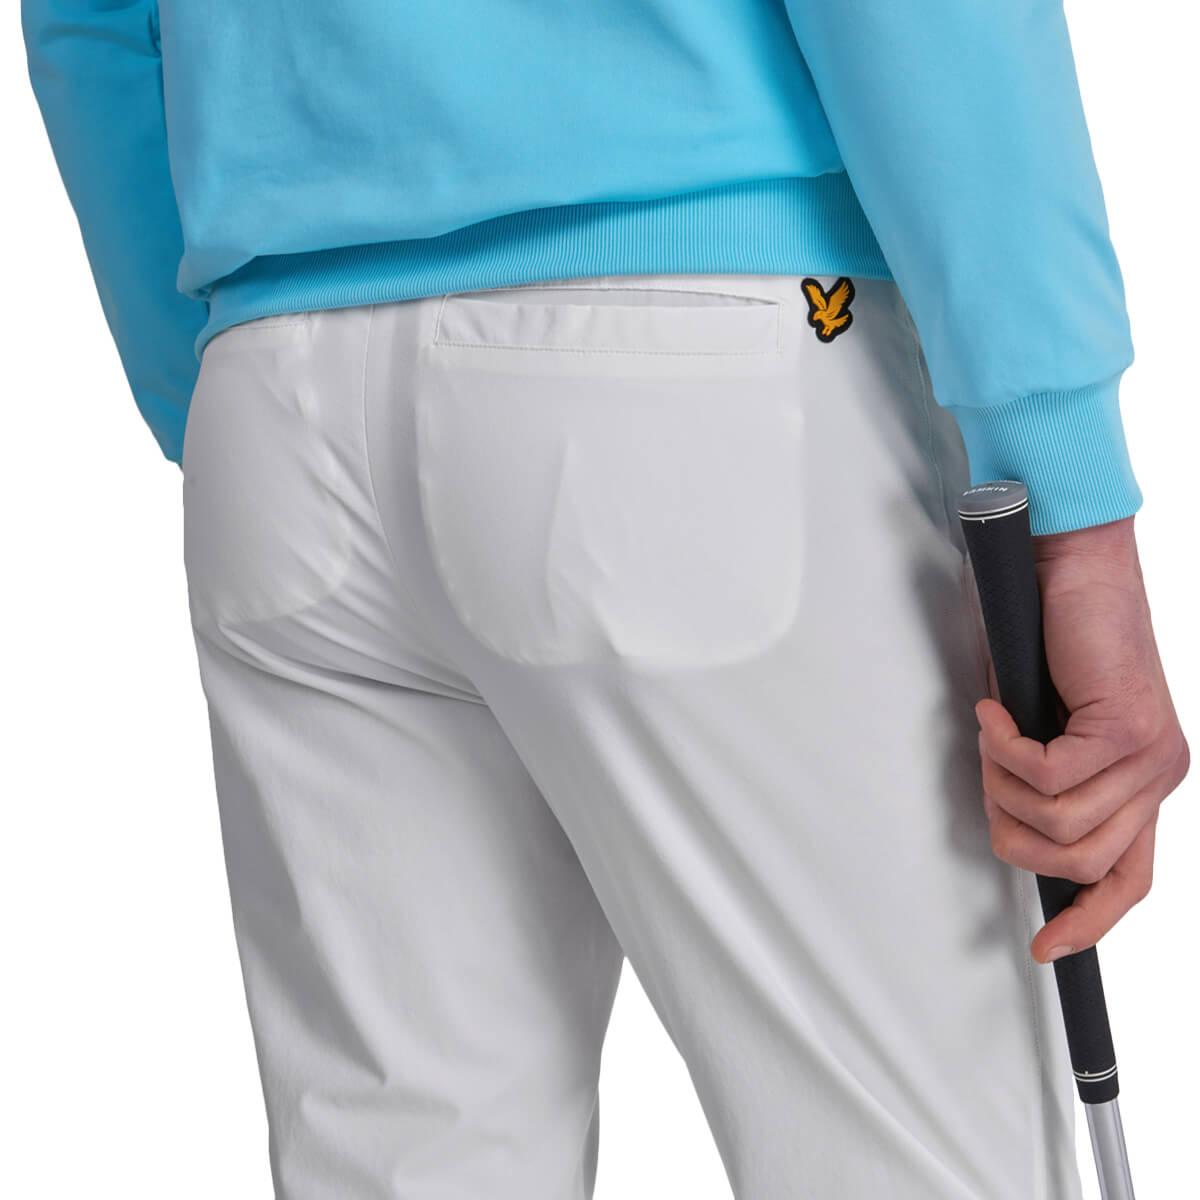 thumbnail 15 - Lyle & Scott Mens Golf Tech Light Stretch Breathable Trousers 55% OFF RRP